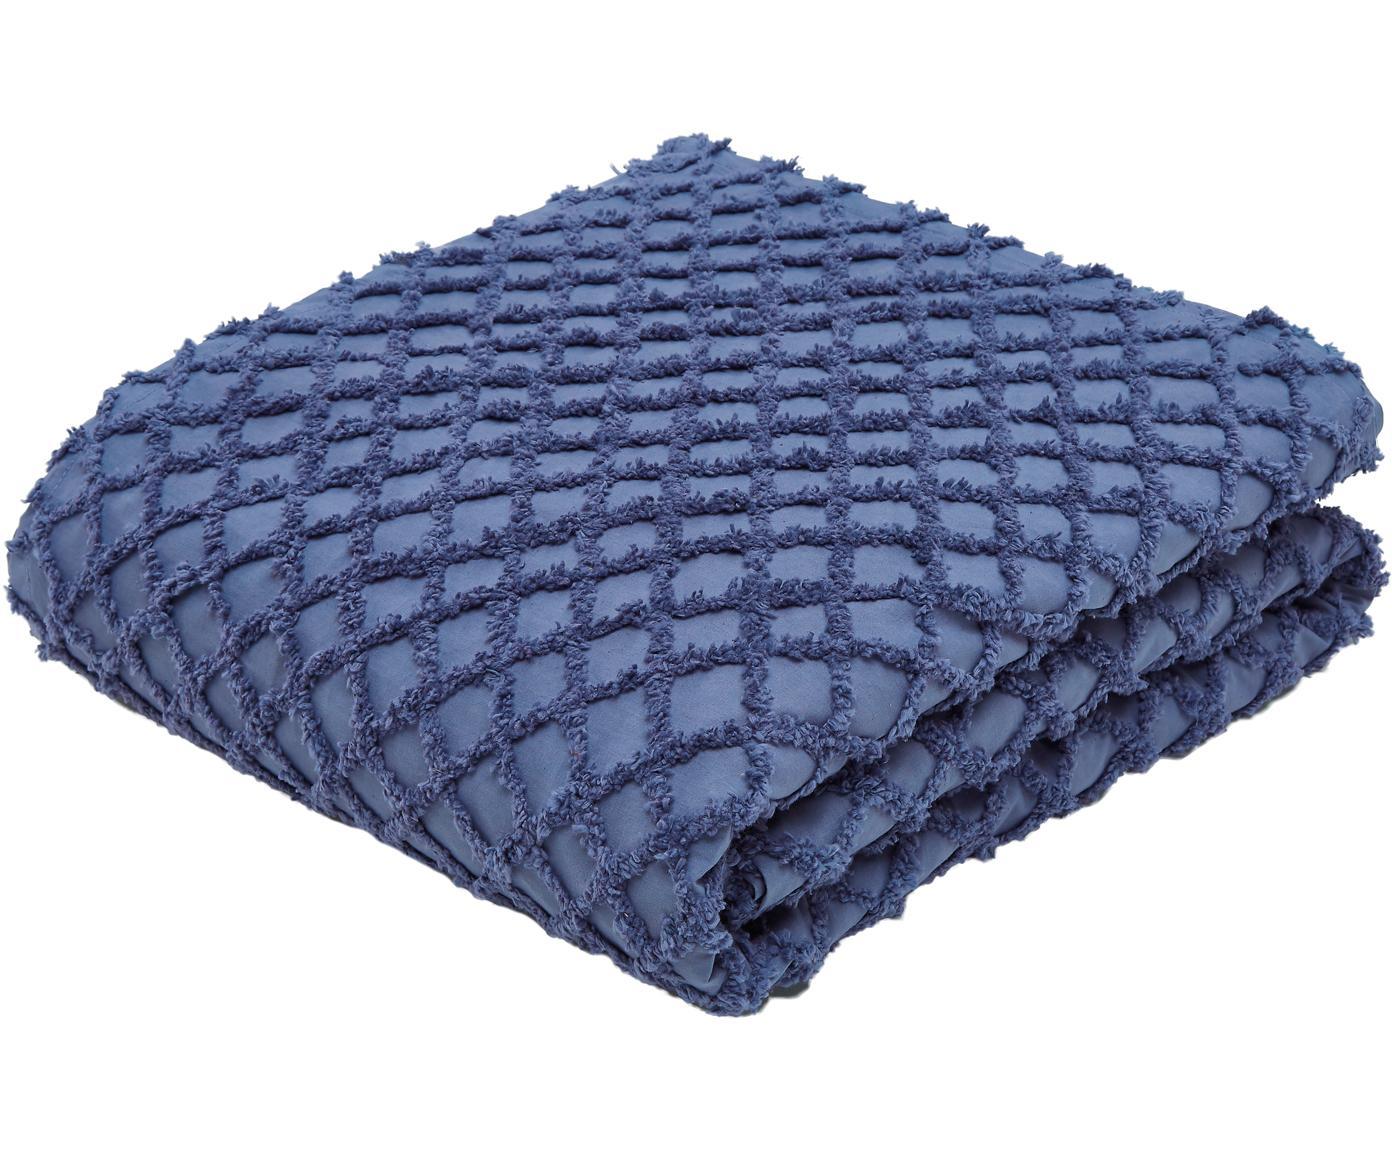 Tagesdecke Royal mit Hoch-Tief-Muster, 100% Baumwolle, Blau, 240 x 260 cm